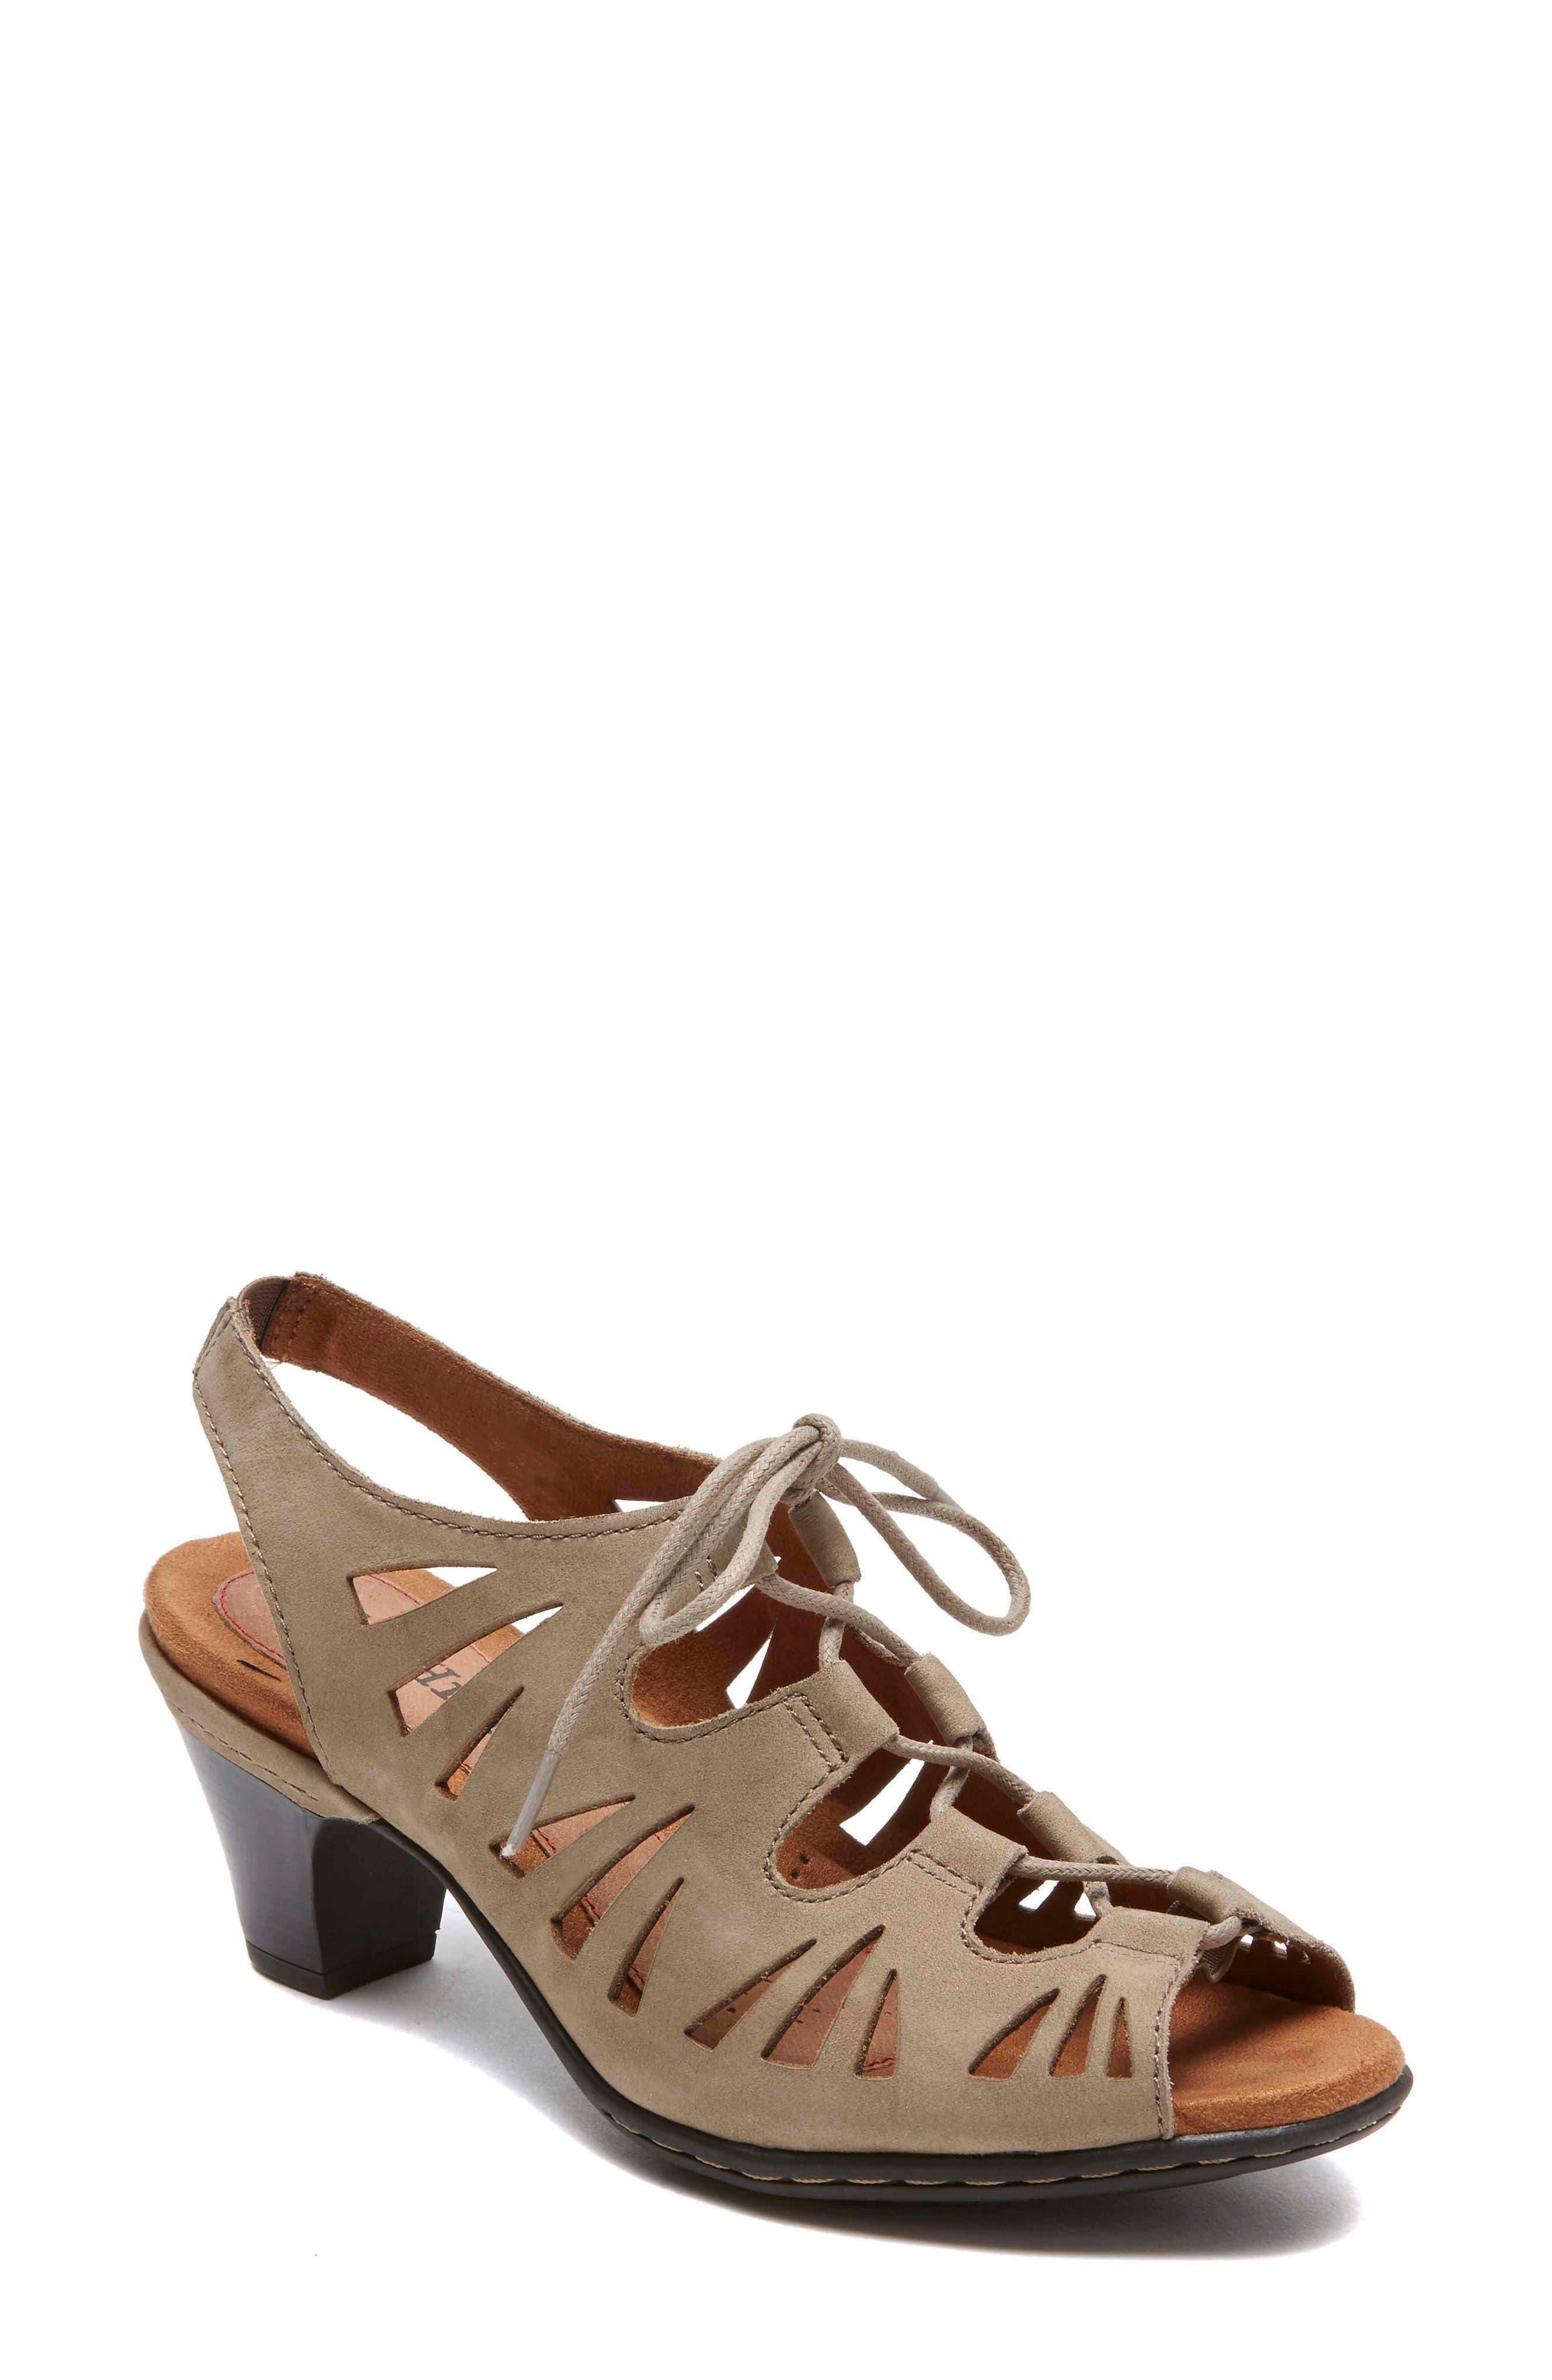 Cobb Hill 'Sasha' Caged Leather Peep Toe Sandal,                         Main,                         color, KHAKI NUBUCK LEATHER